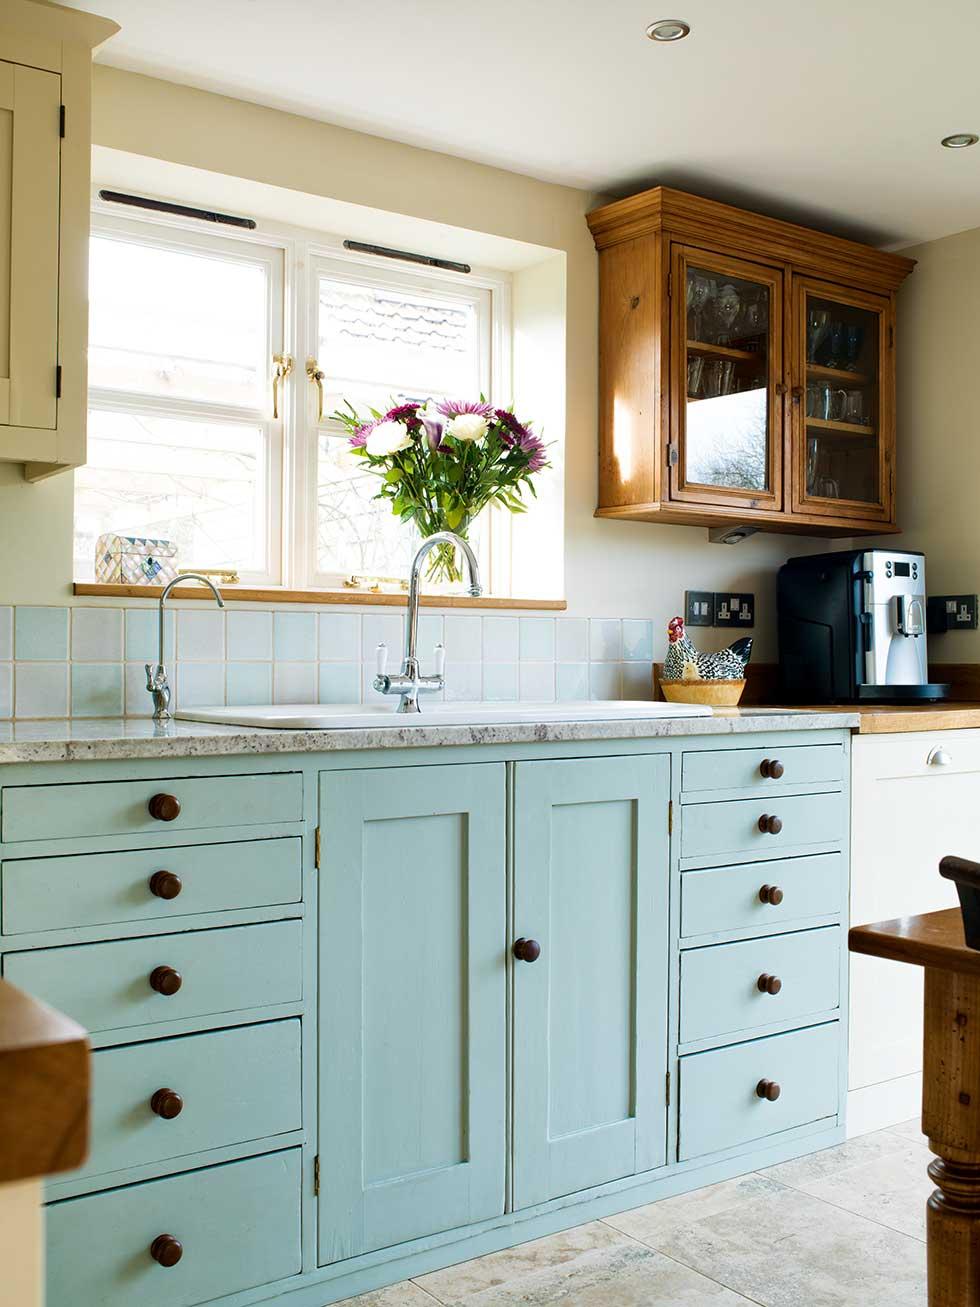 rush-kitchen-sink-unit